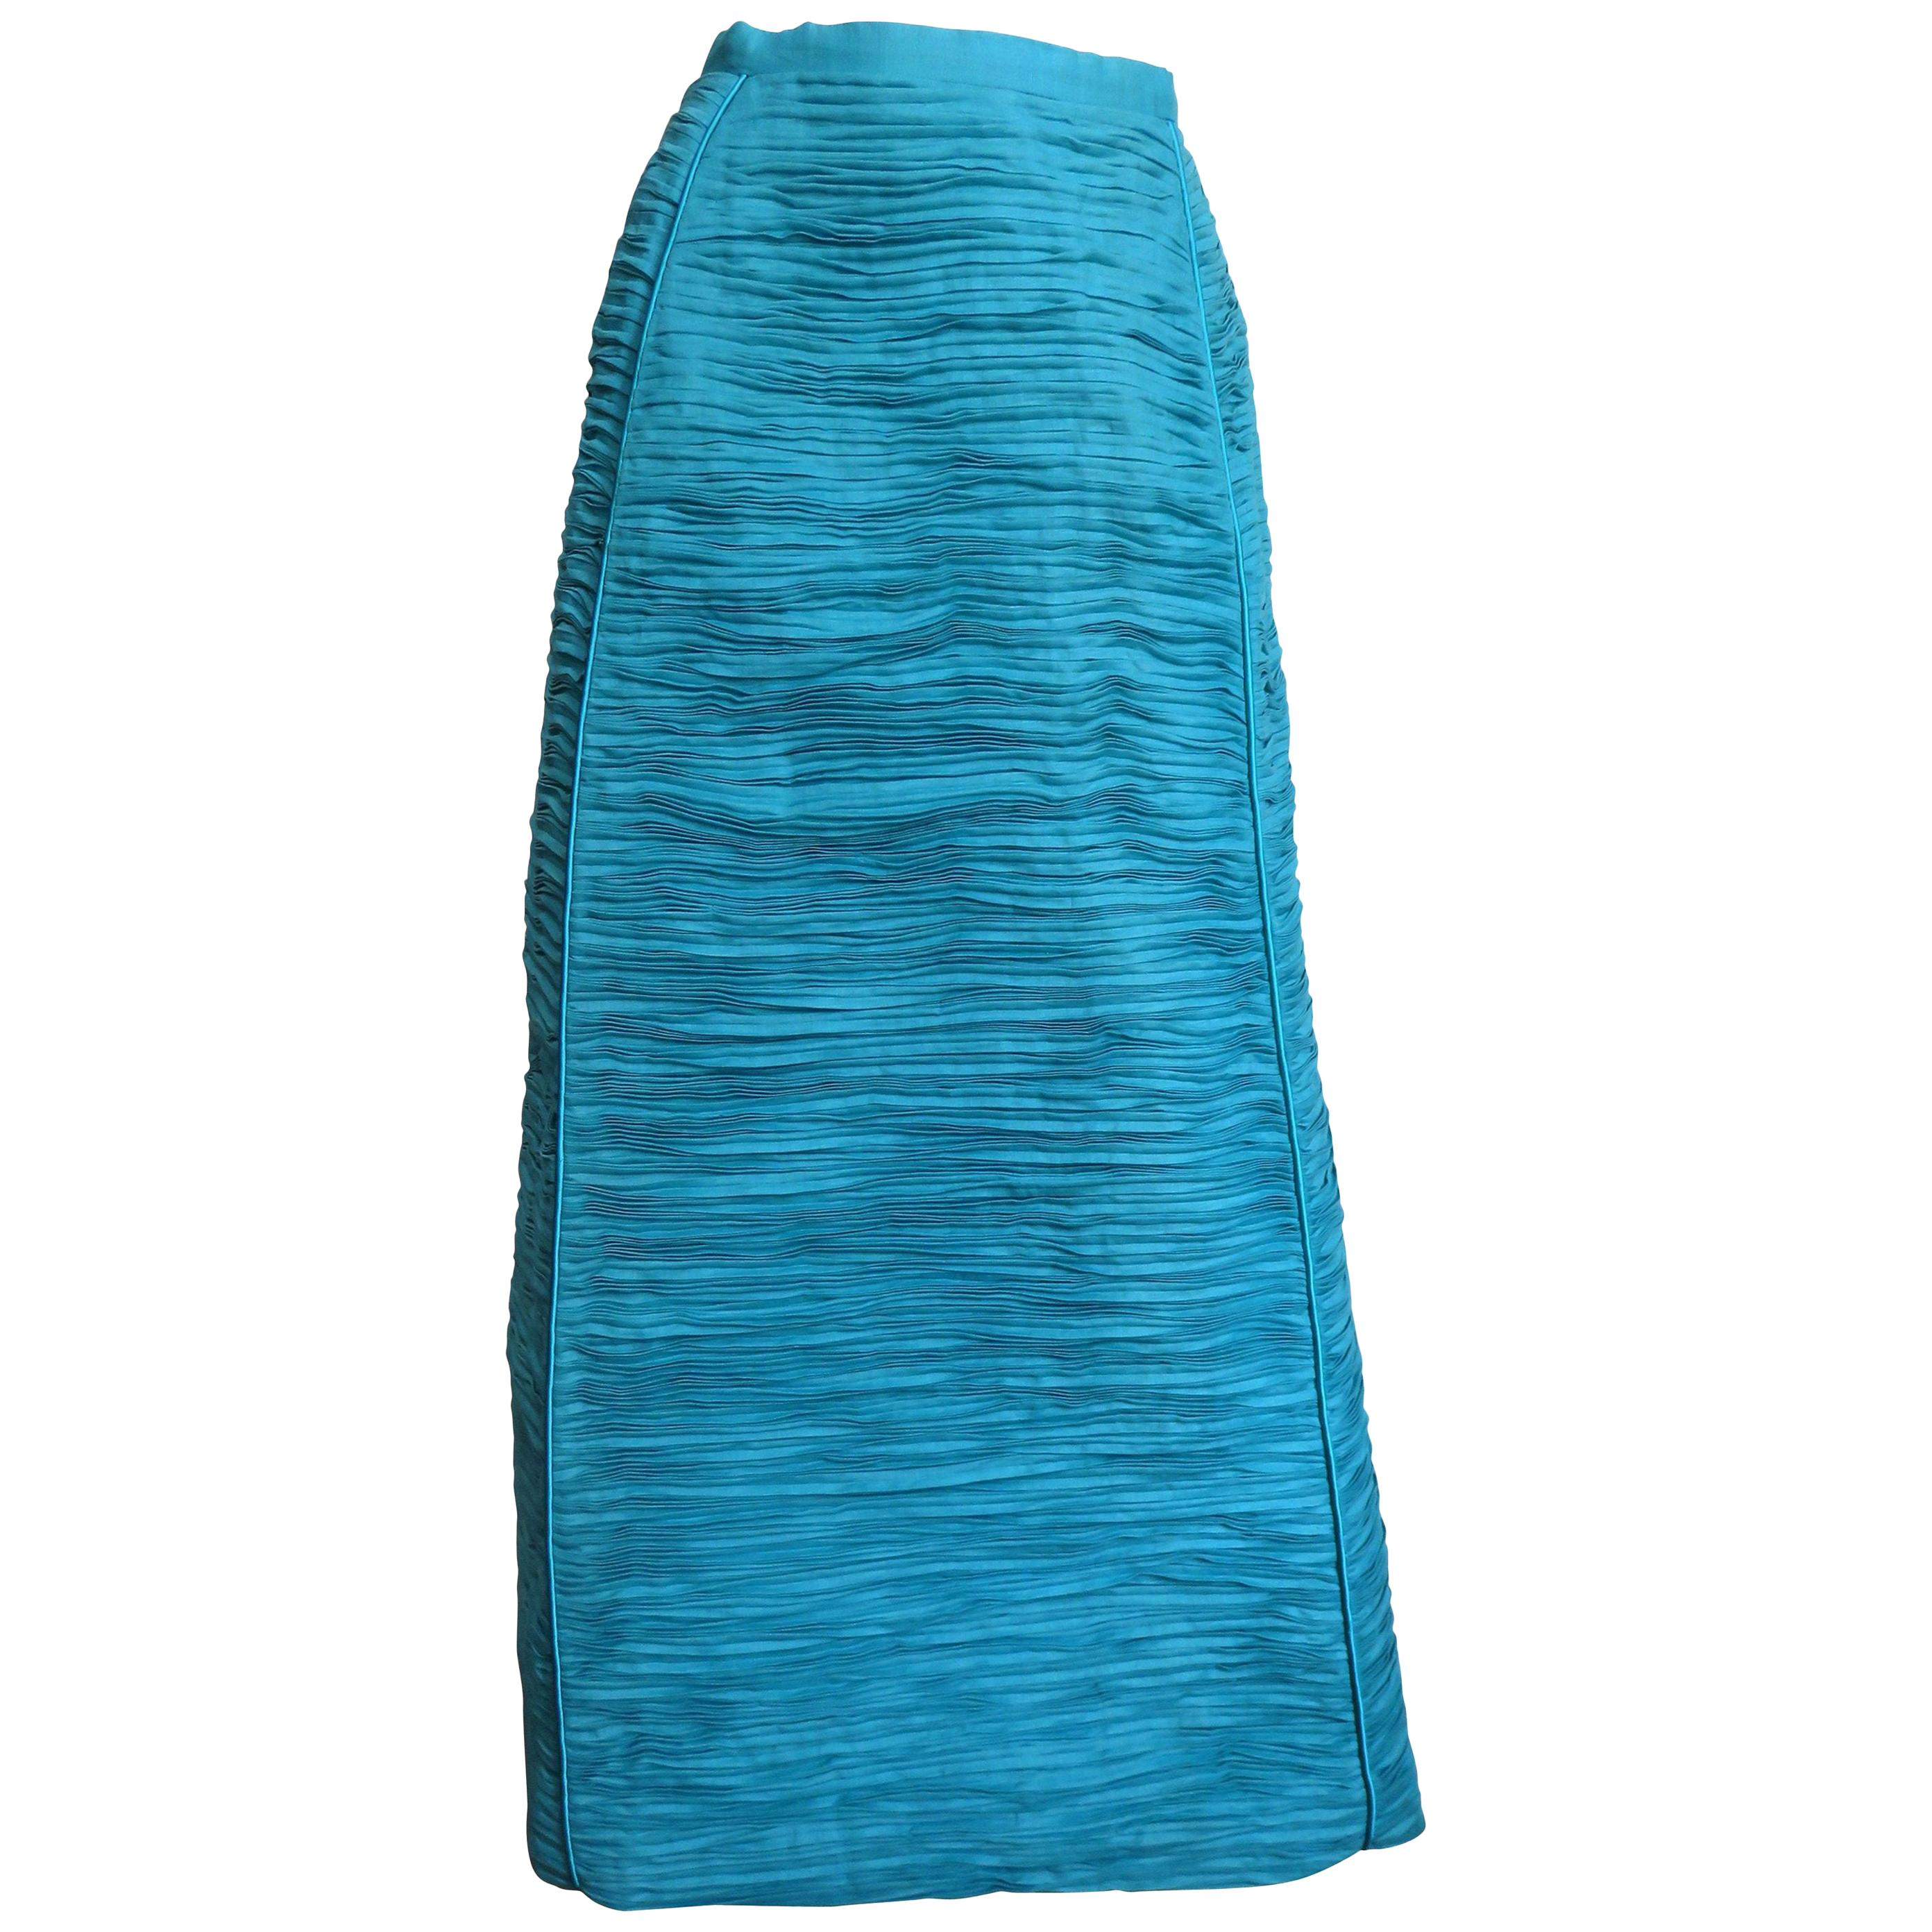 Sybil Connolly Sculptural Linen Maxi Skirt 1960s